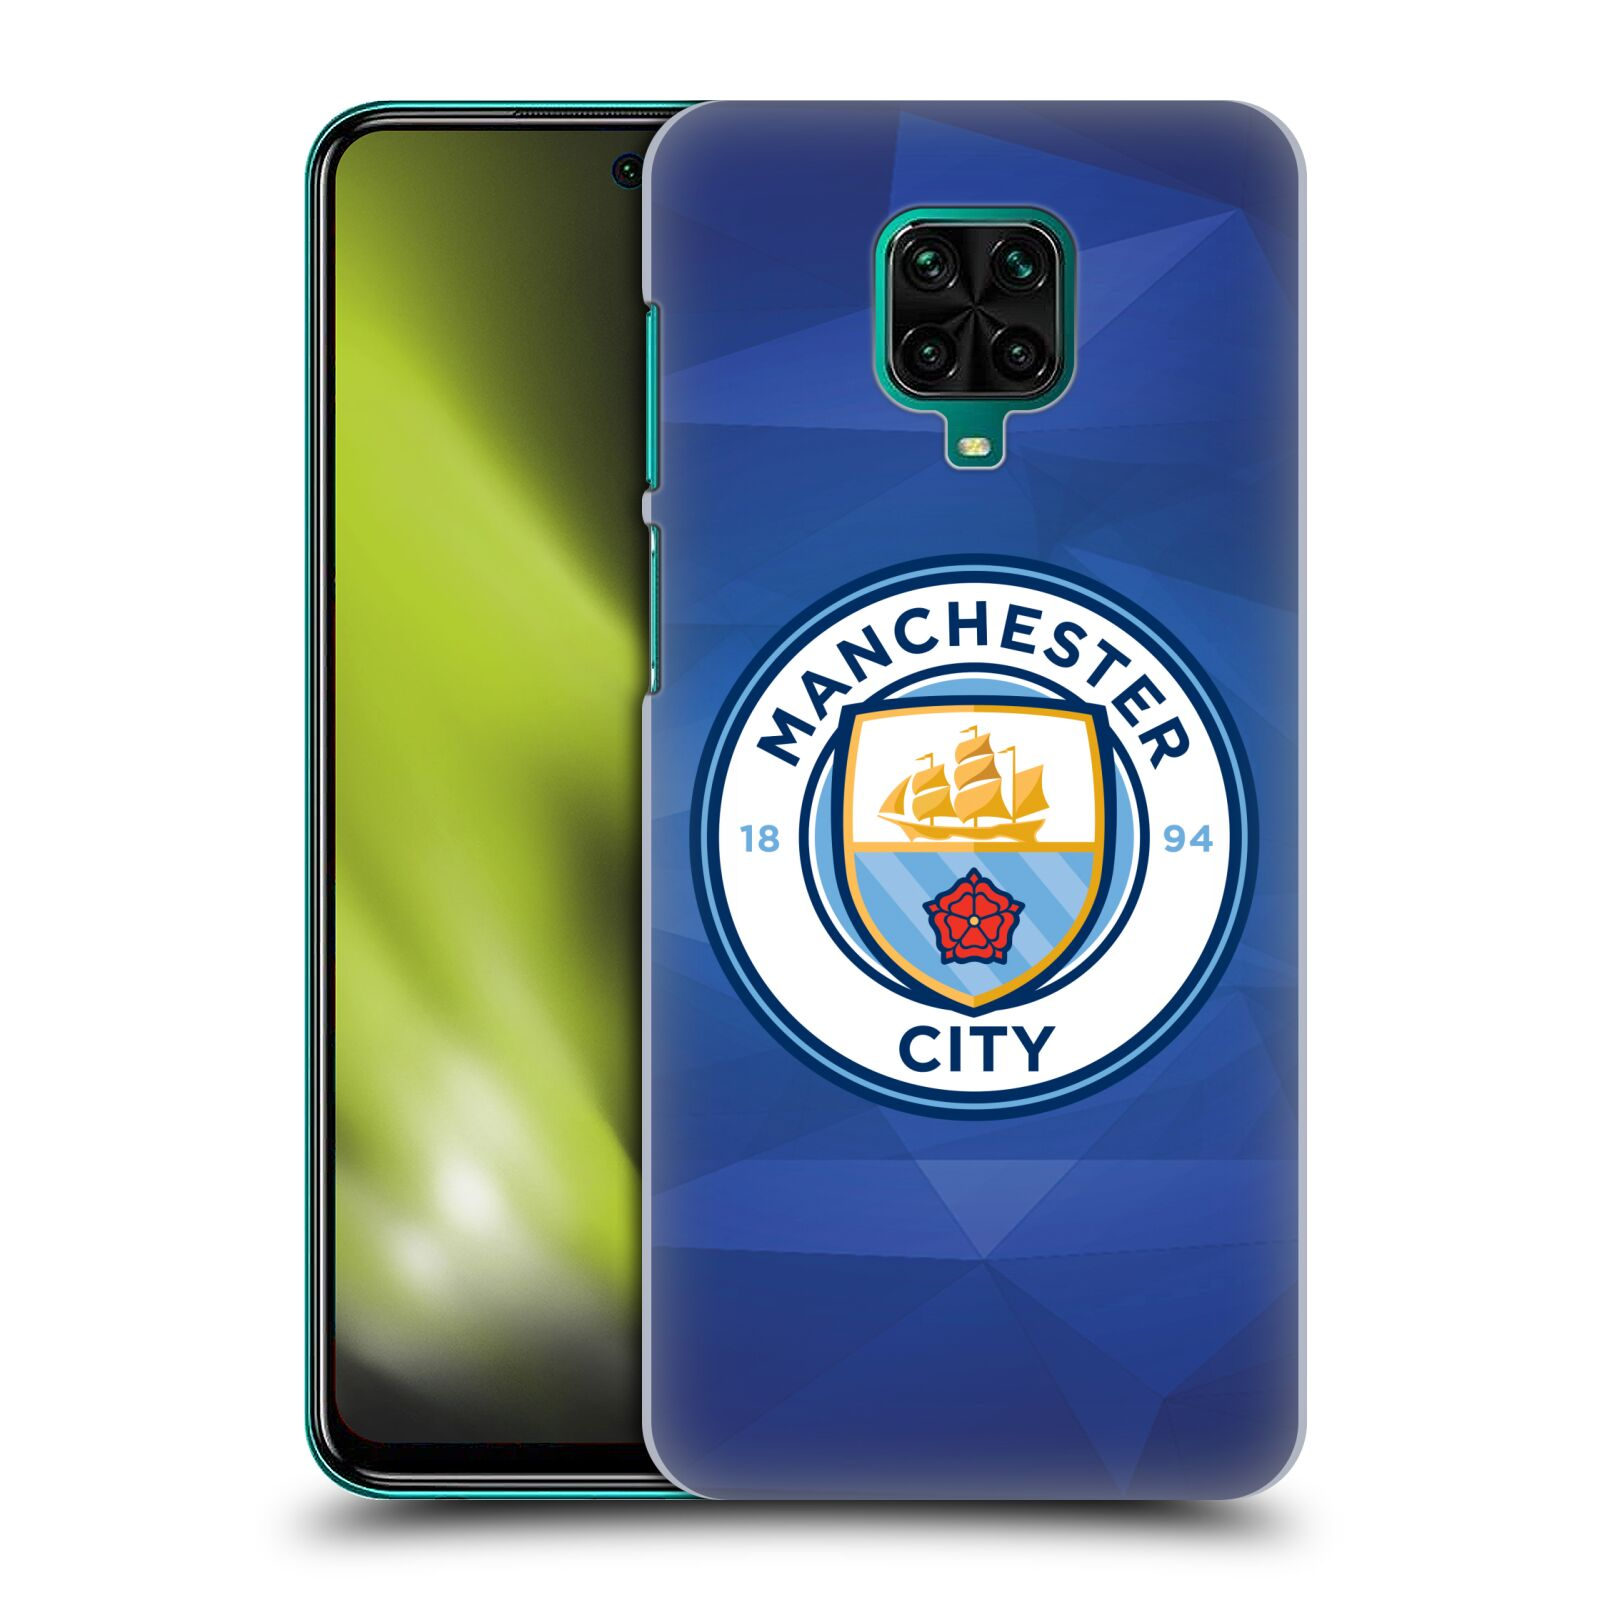 Plastové pouzdro na mobil Xiaomi Redmi Note 9 Pro - Head Case - Manchester City FC - Modré nové logo